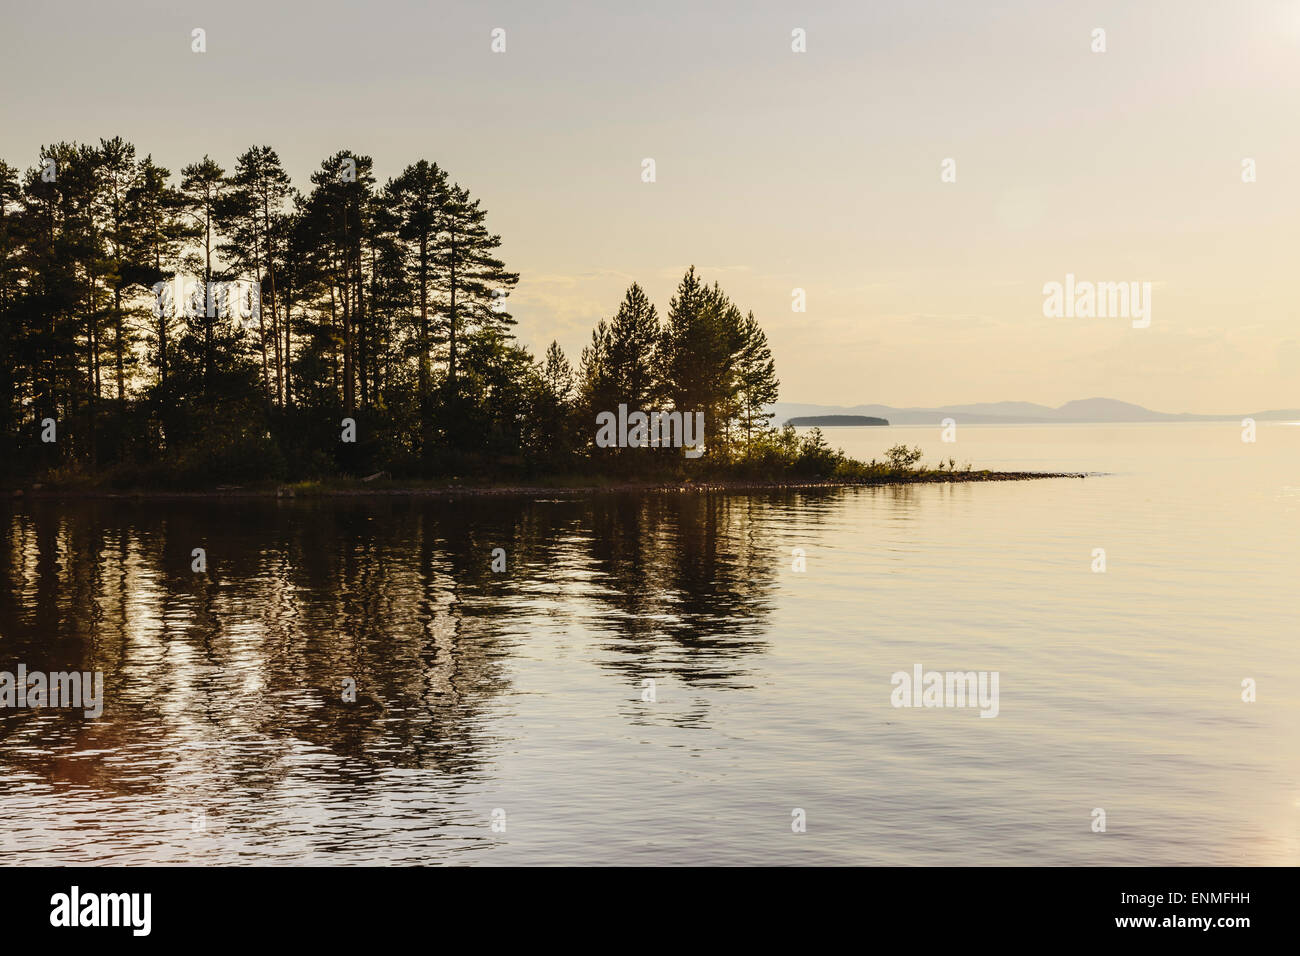 Lake Siljan at sunset in Tallberg Dalarna County, Sweden - Stock Image